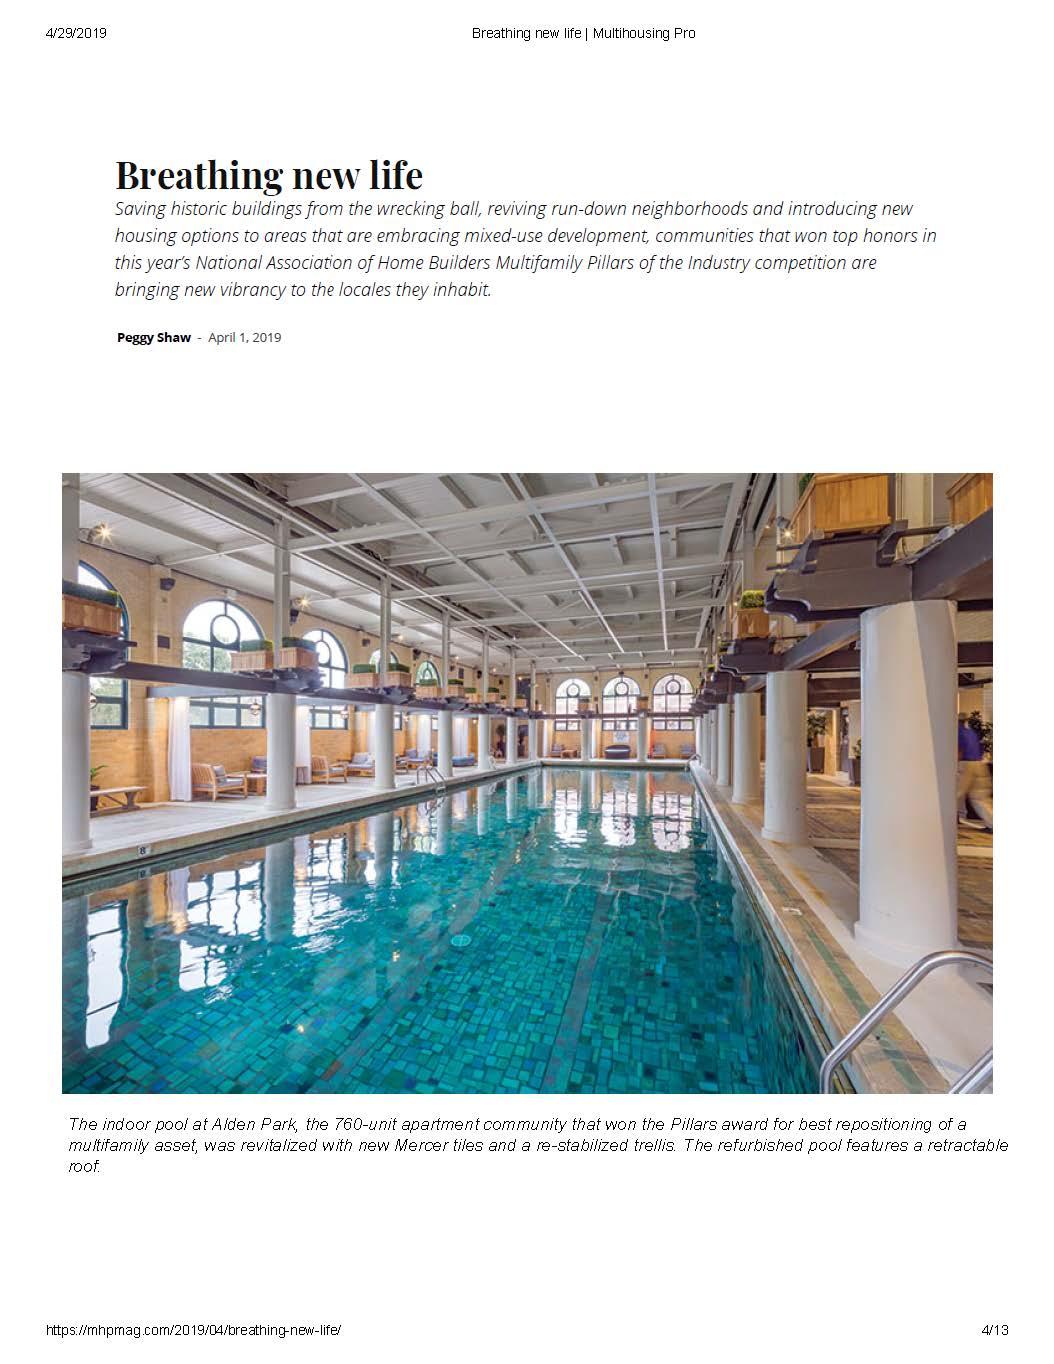 Breathing new life _ Multihousing Pro_Alden Park_edit_Page_1.jpg